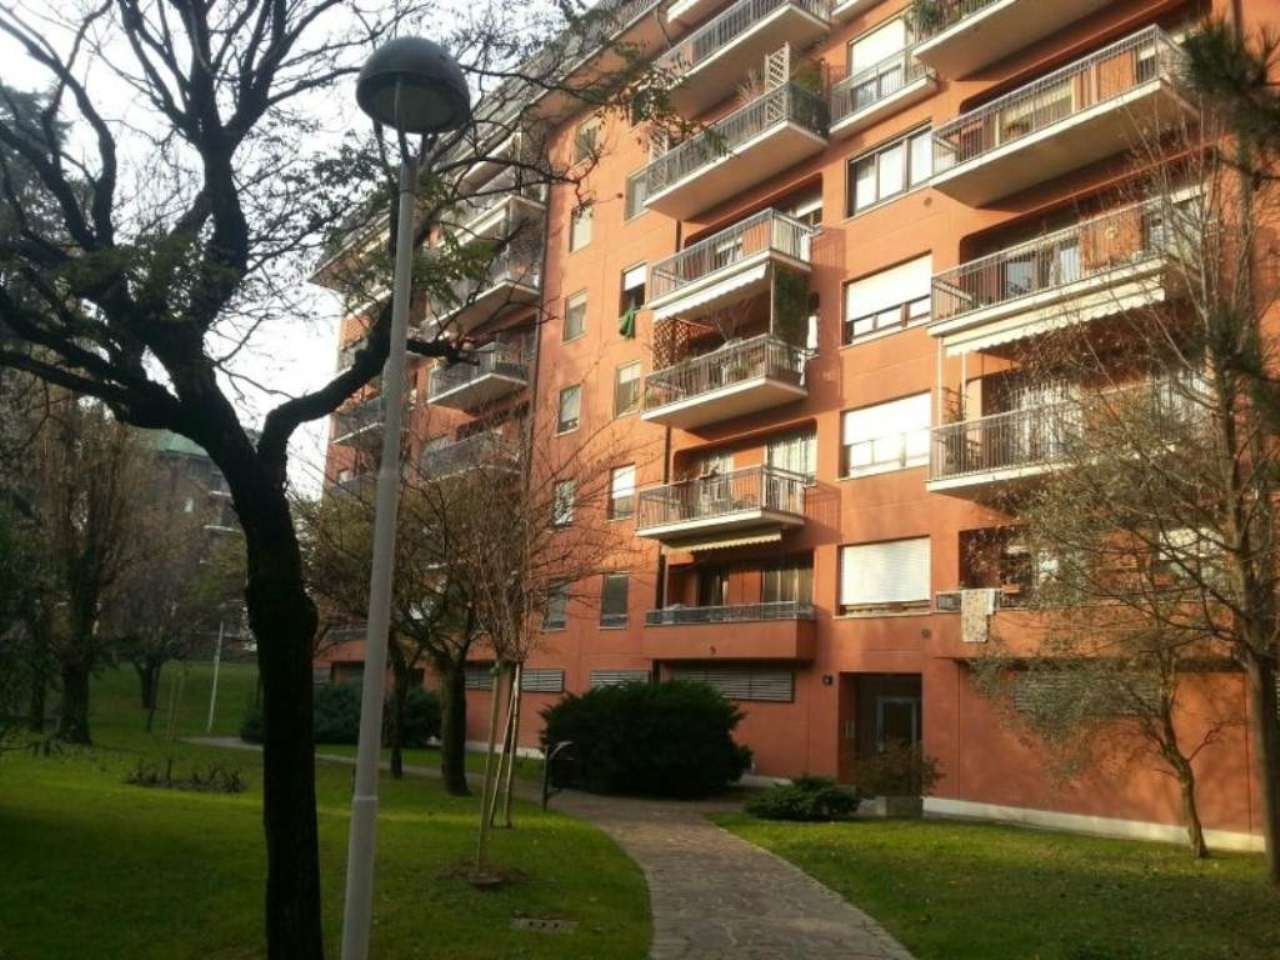 Bilocale Assago Via G. Matteotti 1